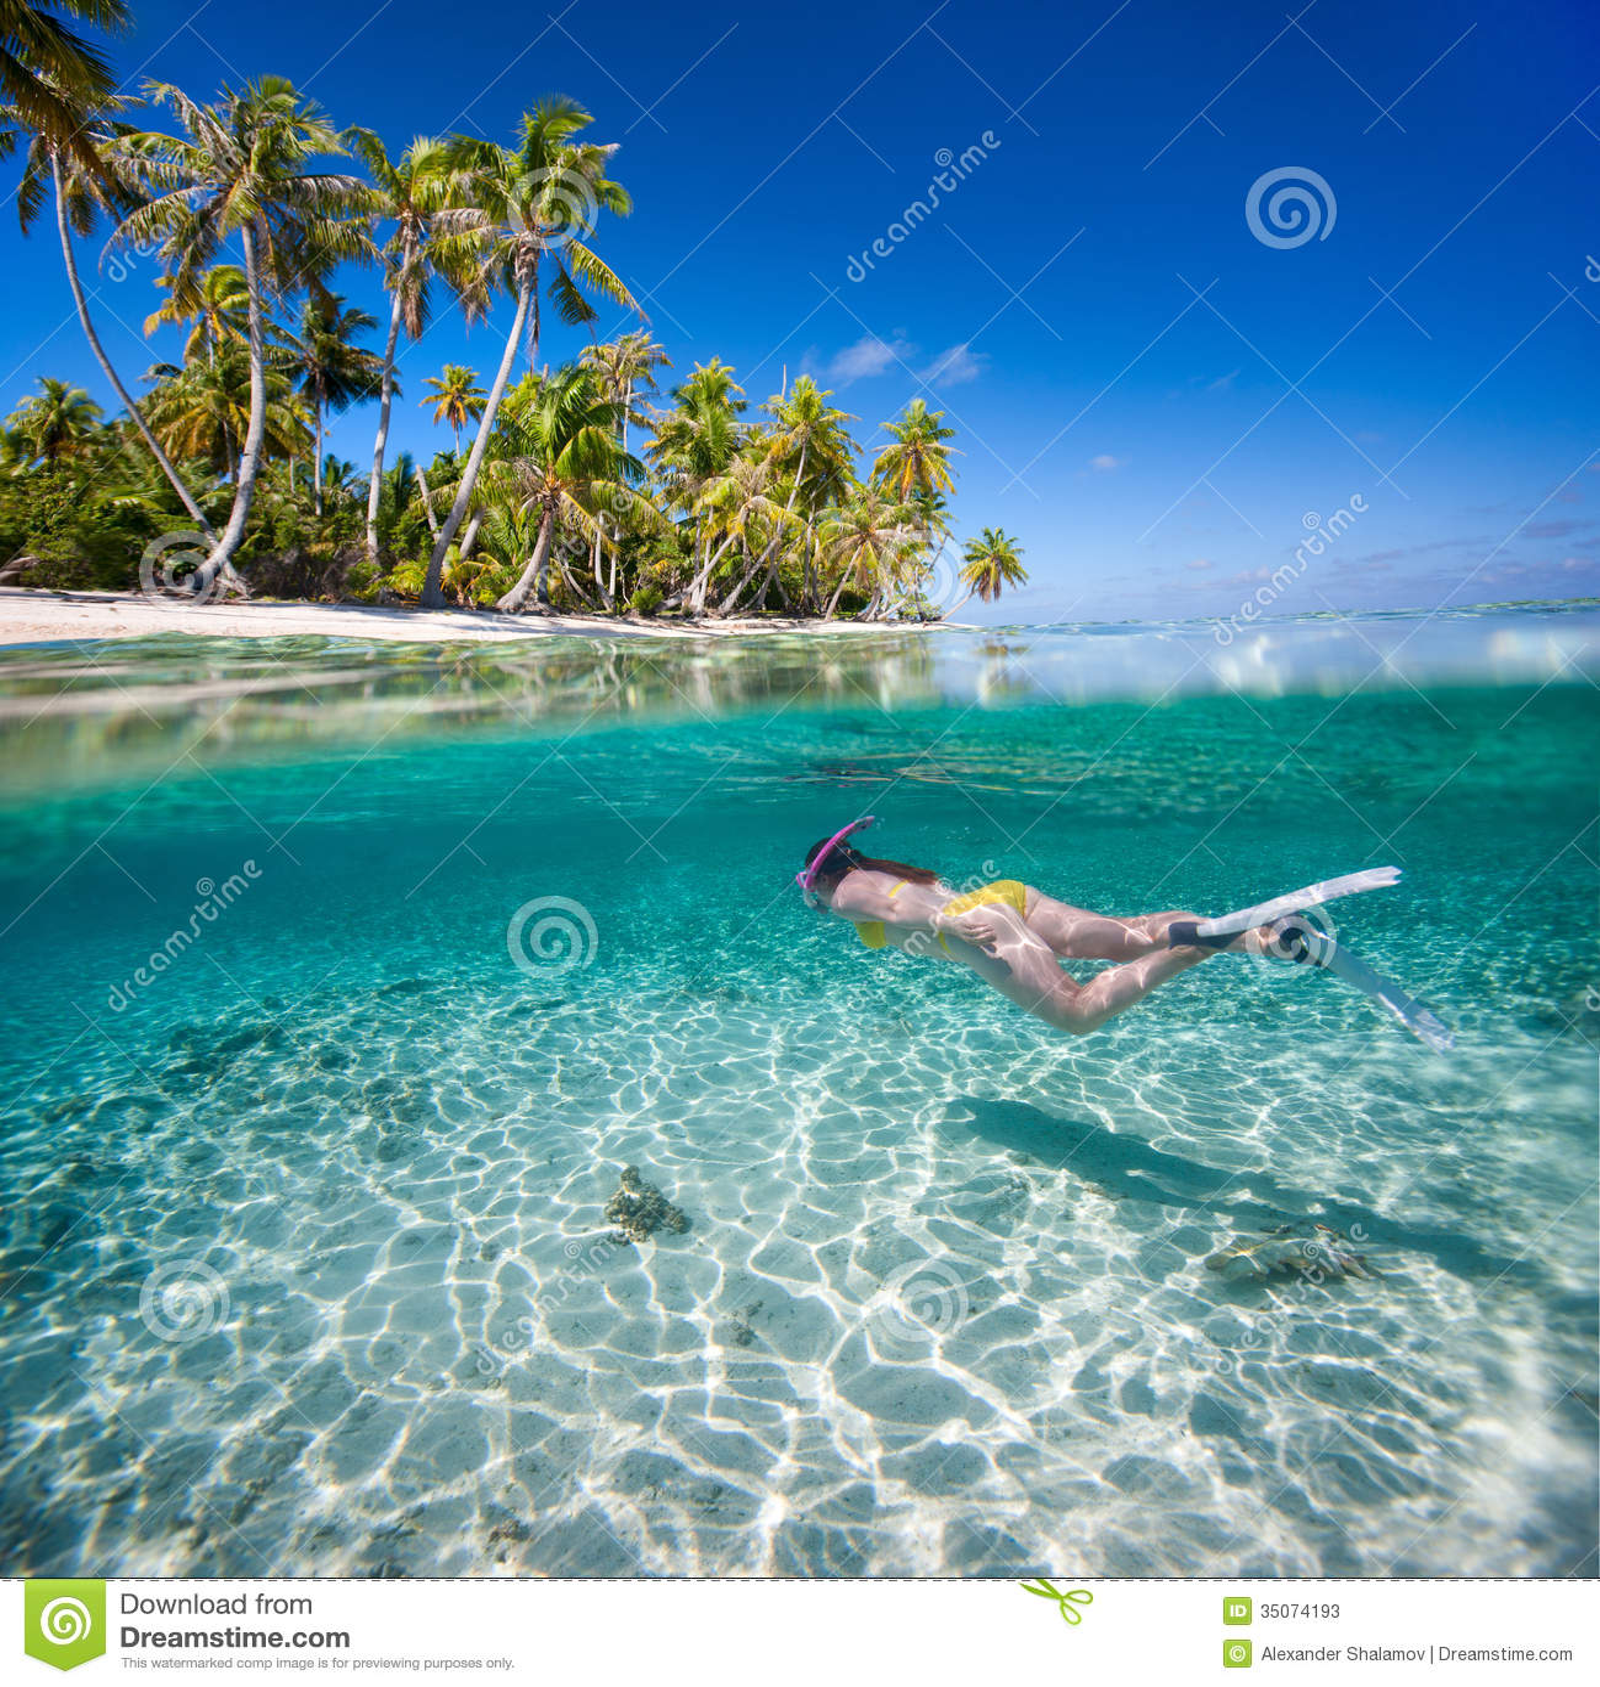 Maldives Tour Attractions